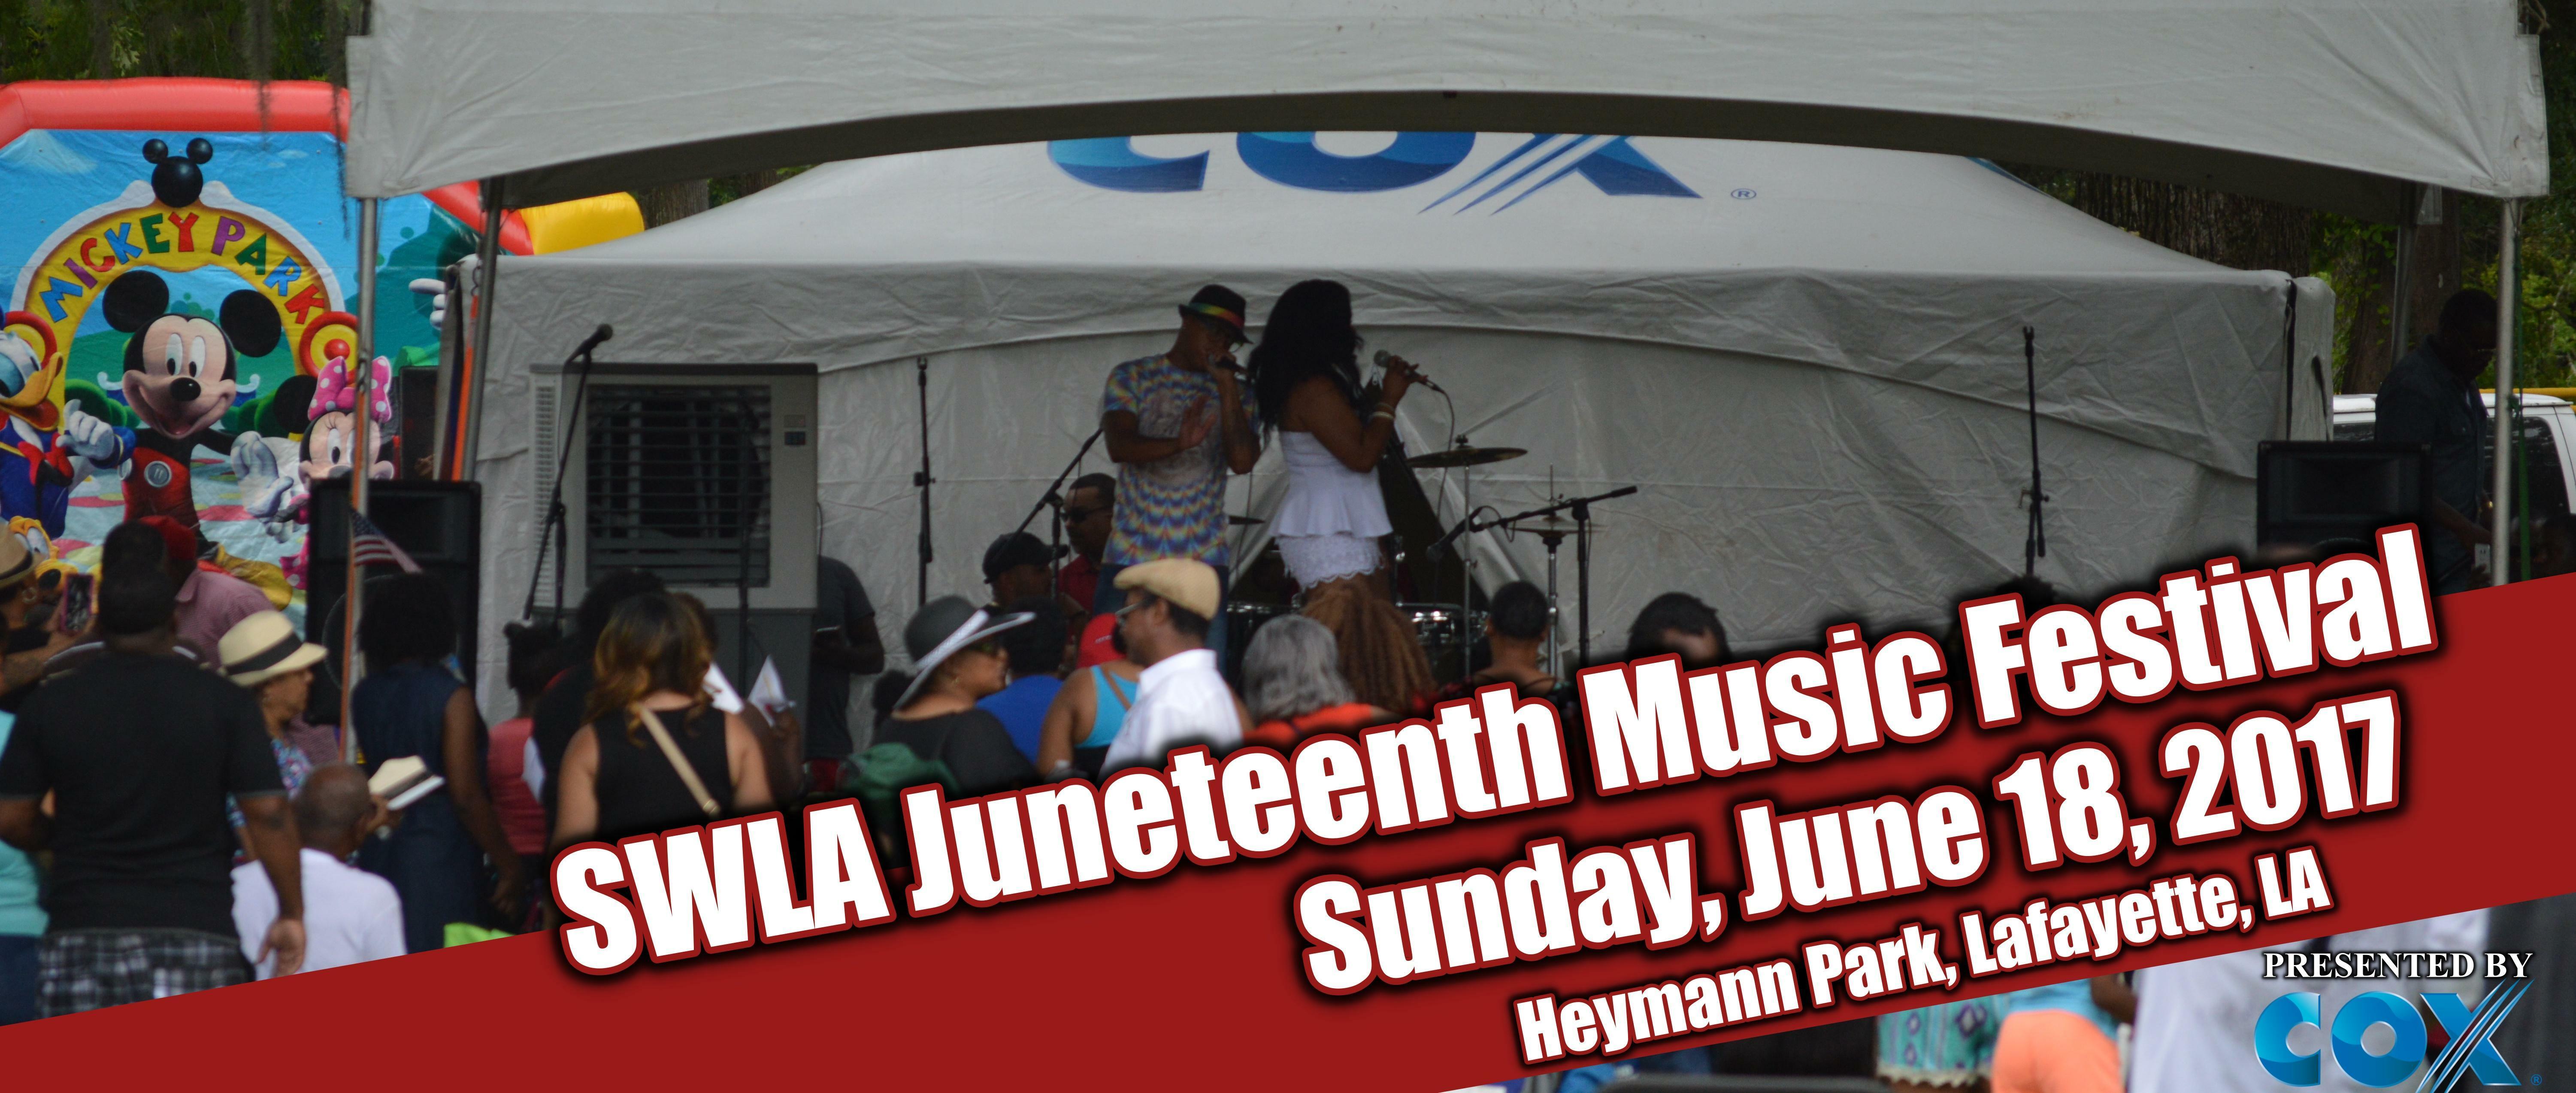 Swla Juneteenth Music Festival New Orleans Tickets N A At Heymann